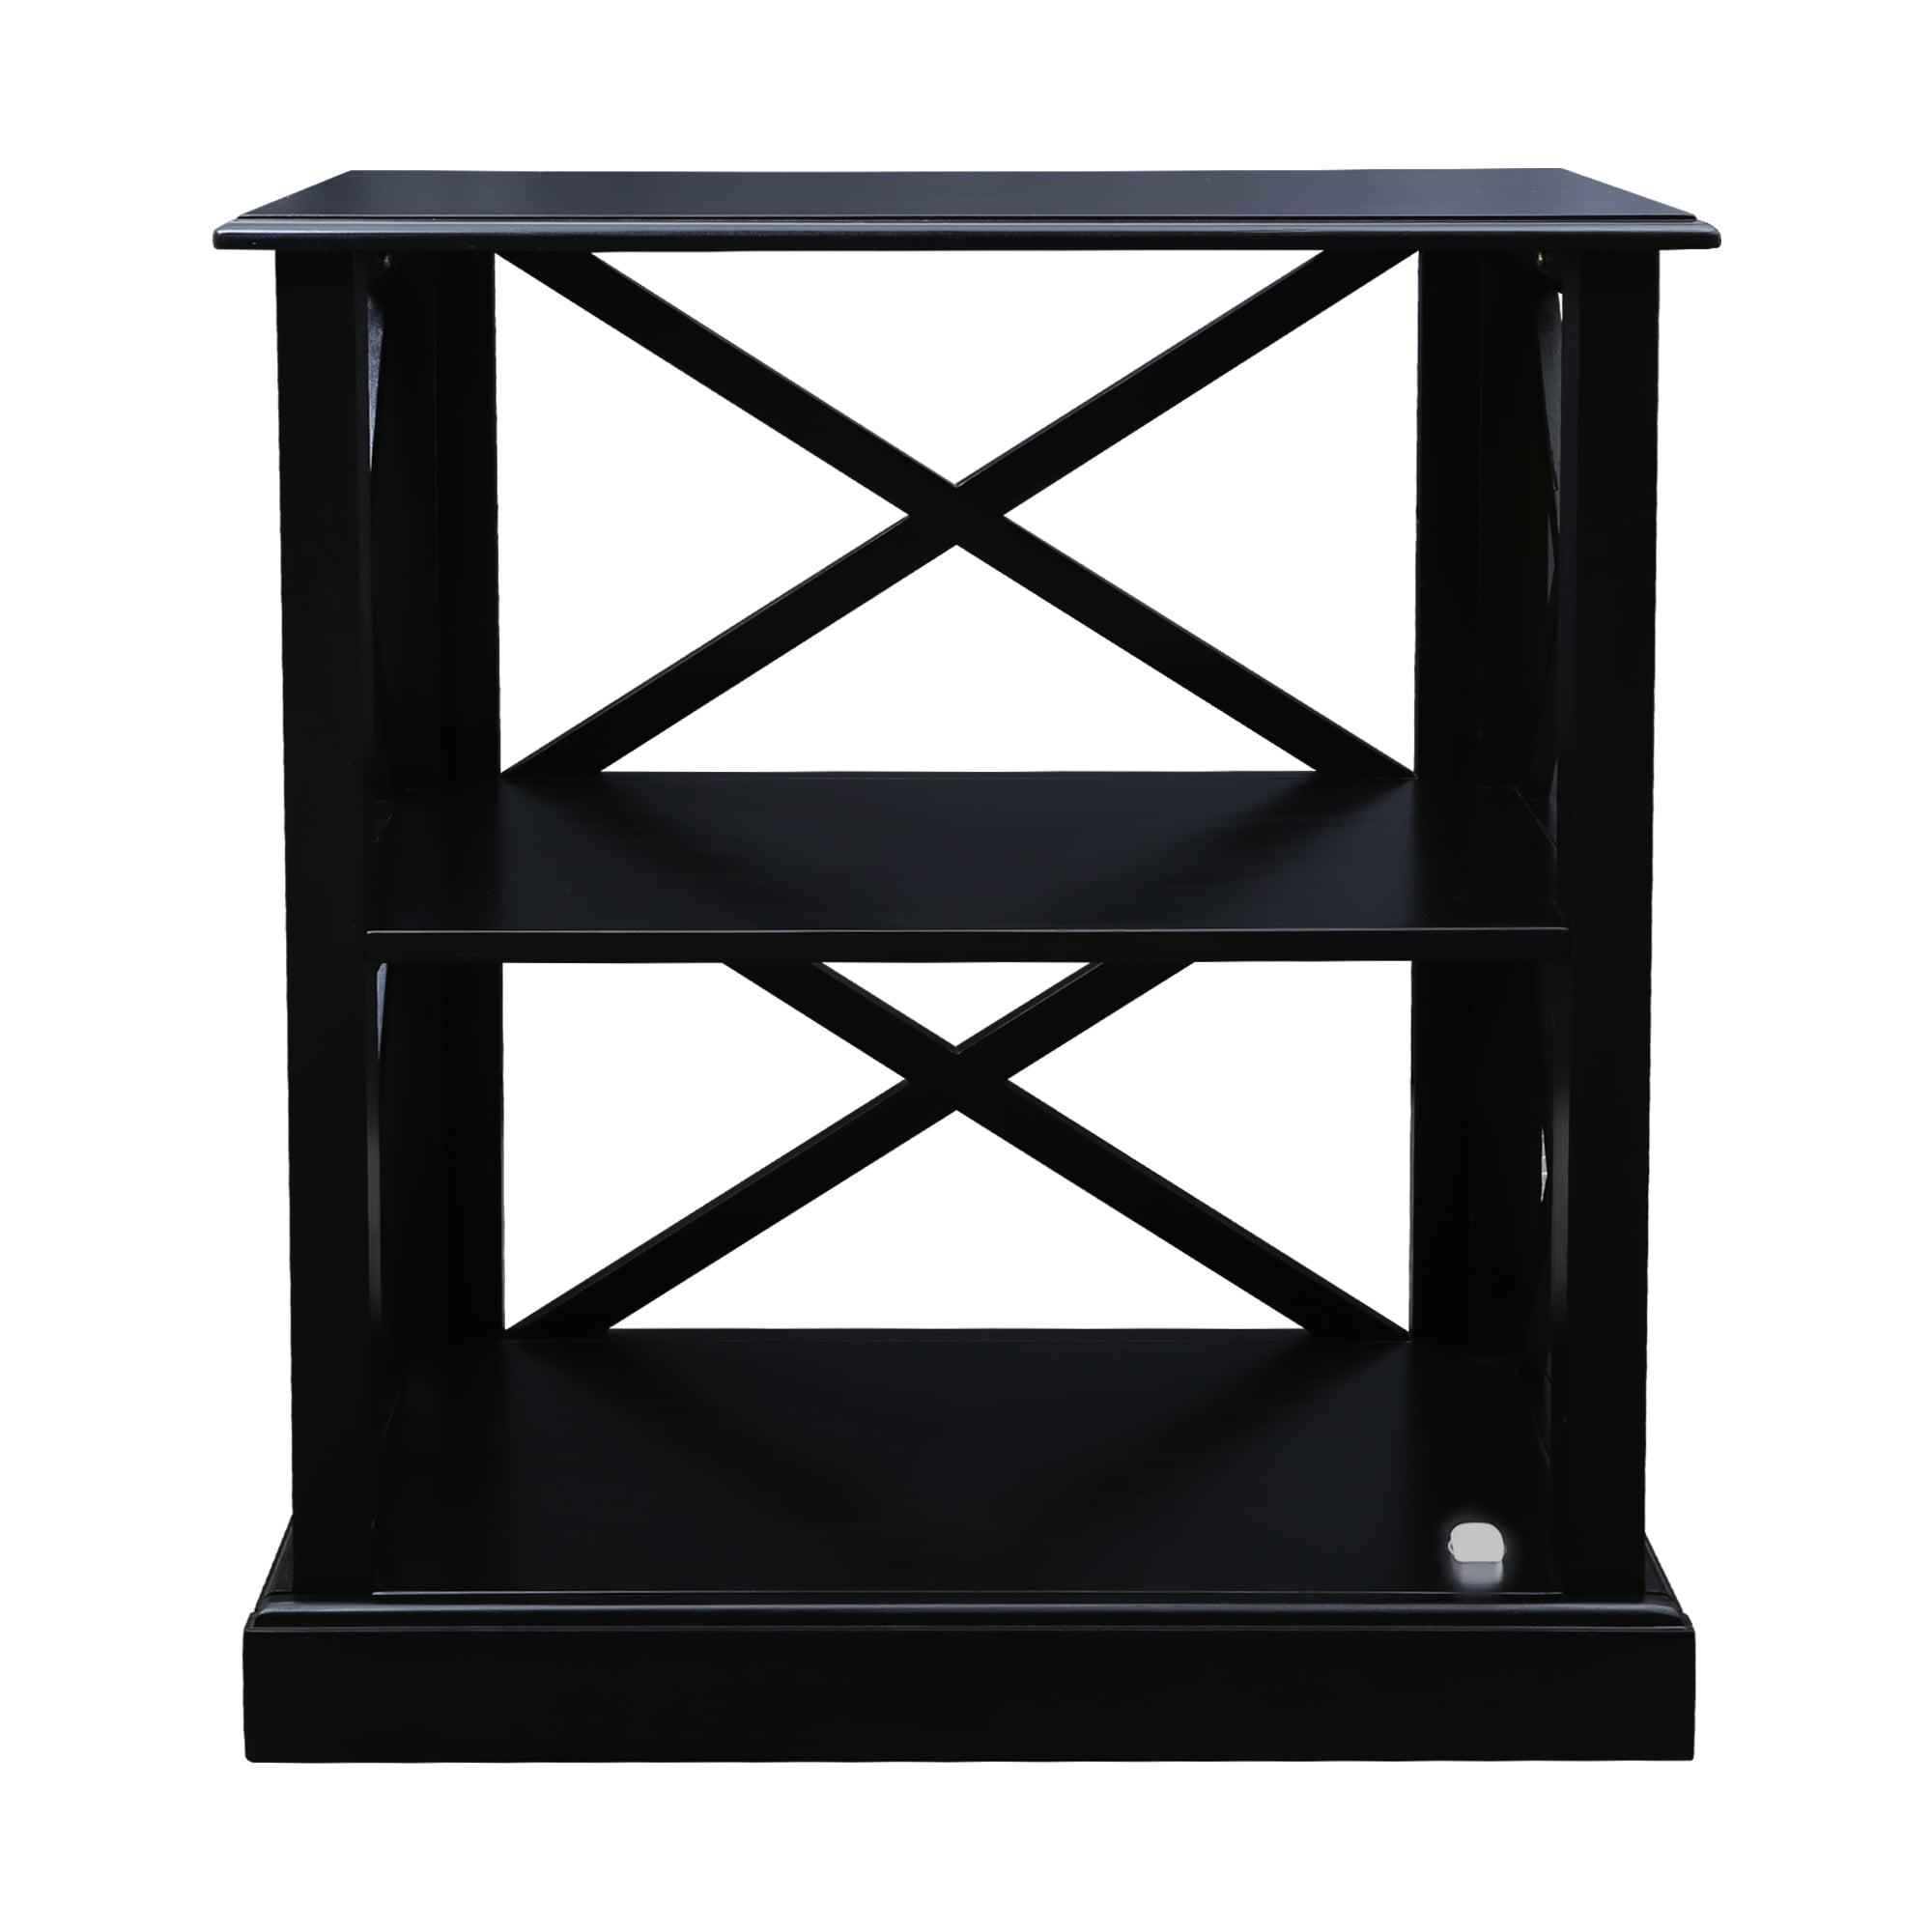 Jackson 3-Shelf Bookcase with Concealed Drawer, Concealment Furniture